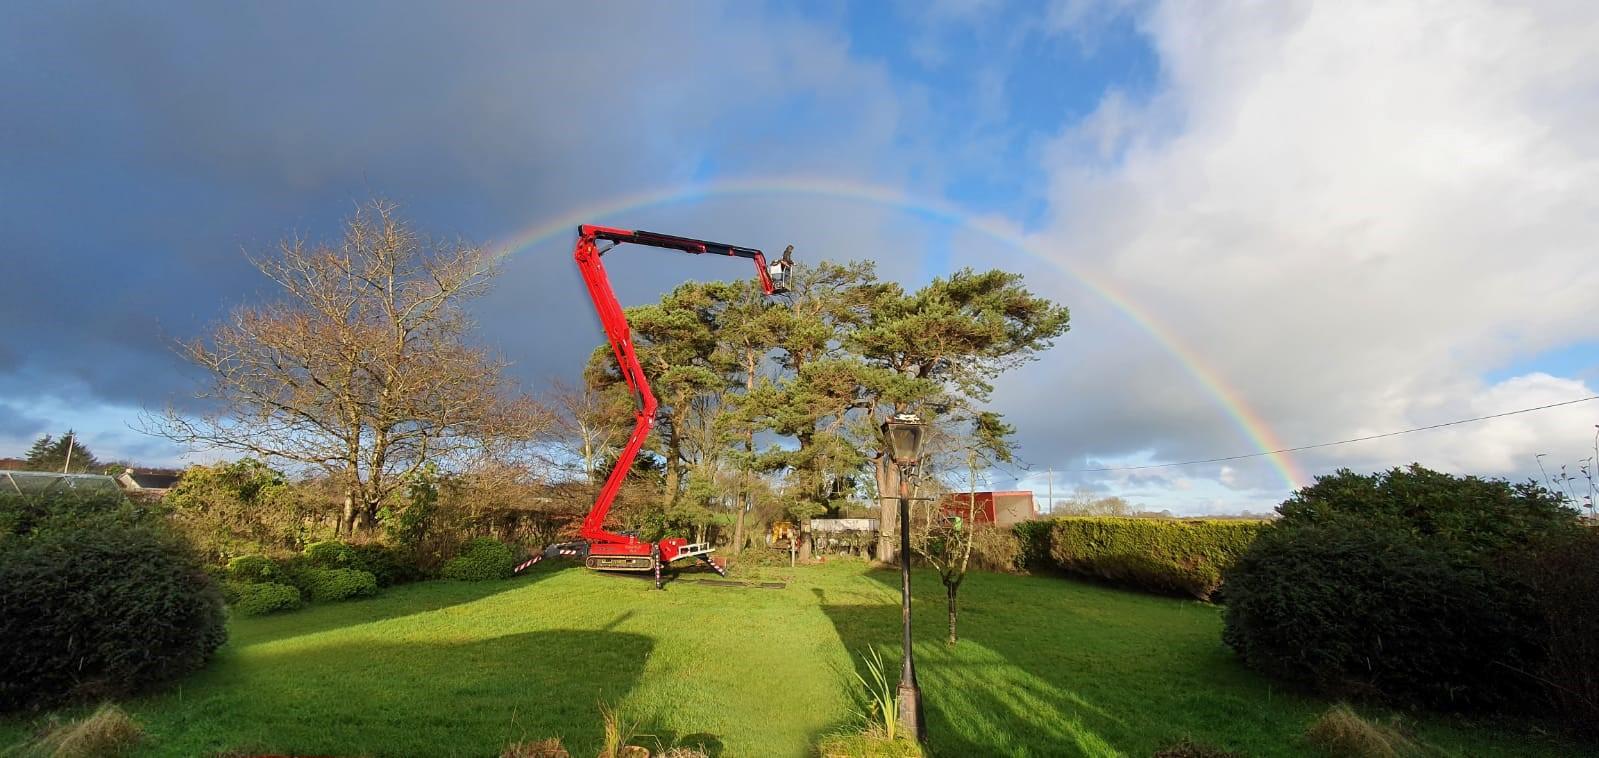 Tree surgeon invests in new Hinowa spider platform – and gets free rainbow